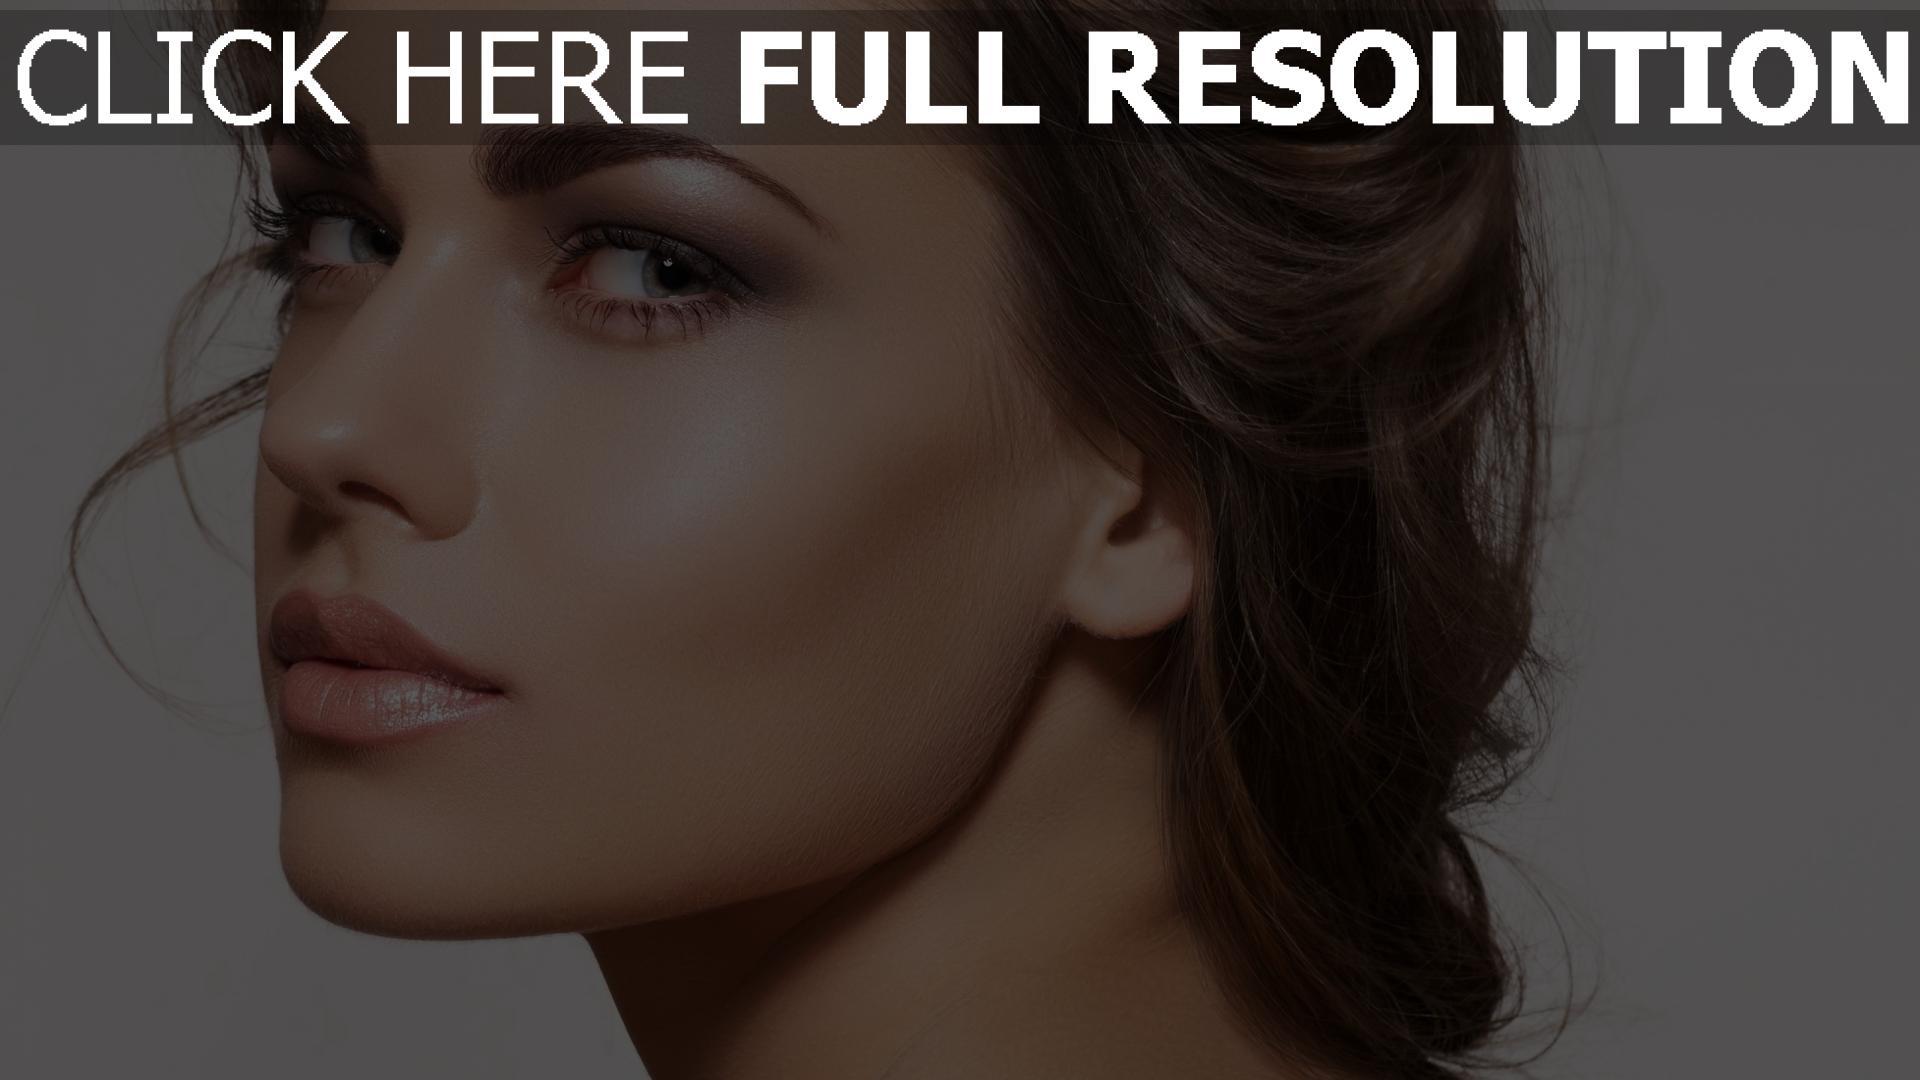 hd hintergrundbilder make-up modell gesicht blick brünett 1920x1080